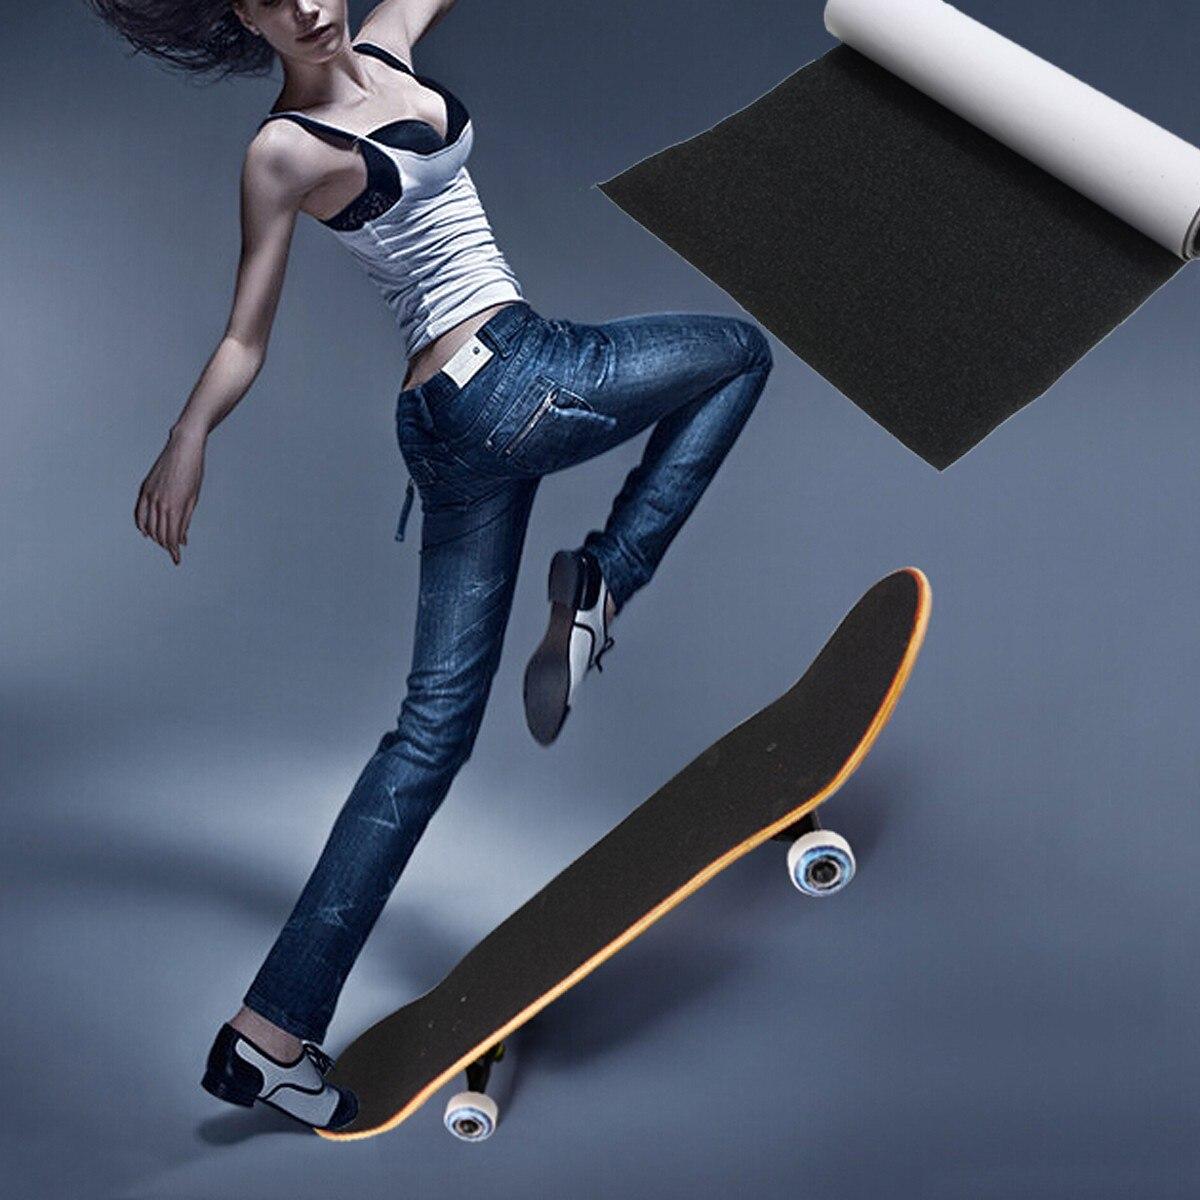 Skate Board Rollschuhe, Skateboards Und Roller Symbol Der Marke Wasserdicht Skateboard Griff Band Skateboard Schleifpapier Mini Fisch Bord Longboard Deck Griptapes Sand Papier 22,5x83,5 Cm Hochglanzpoliert